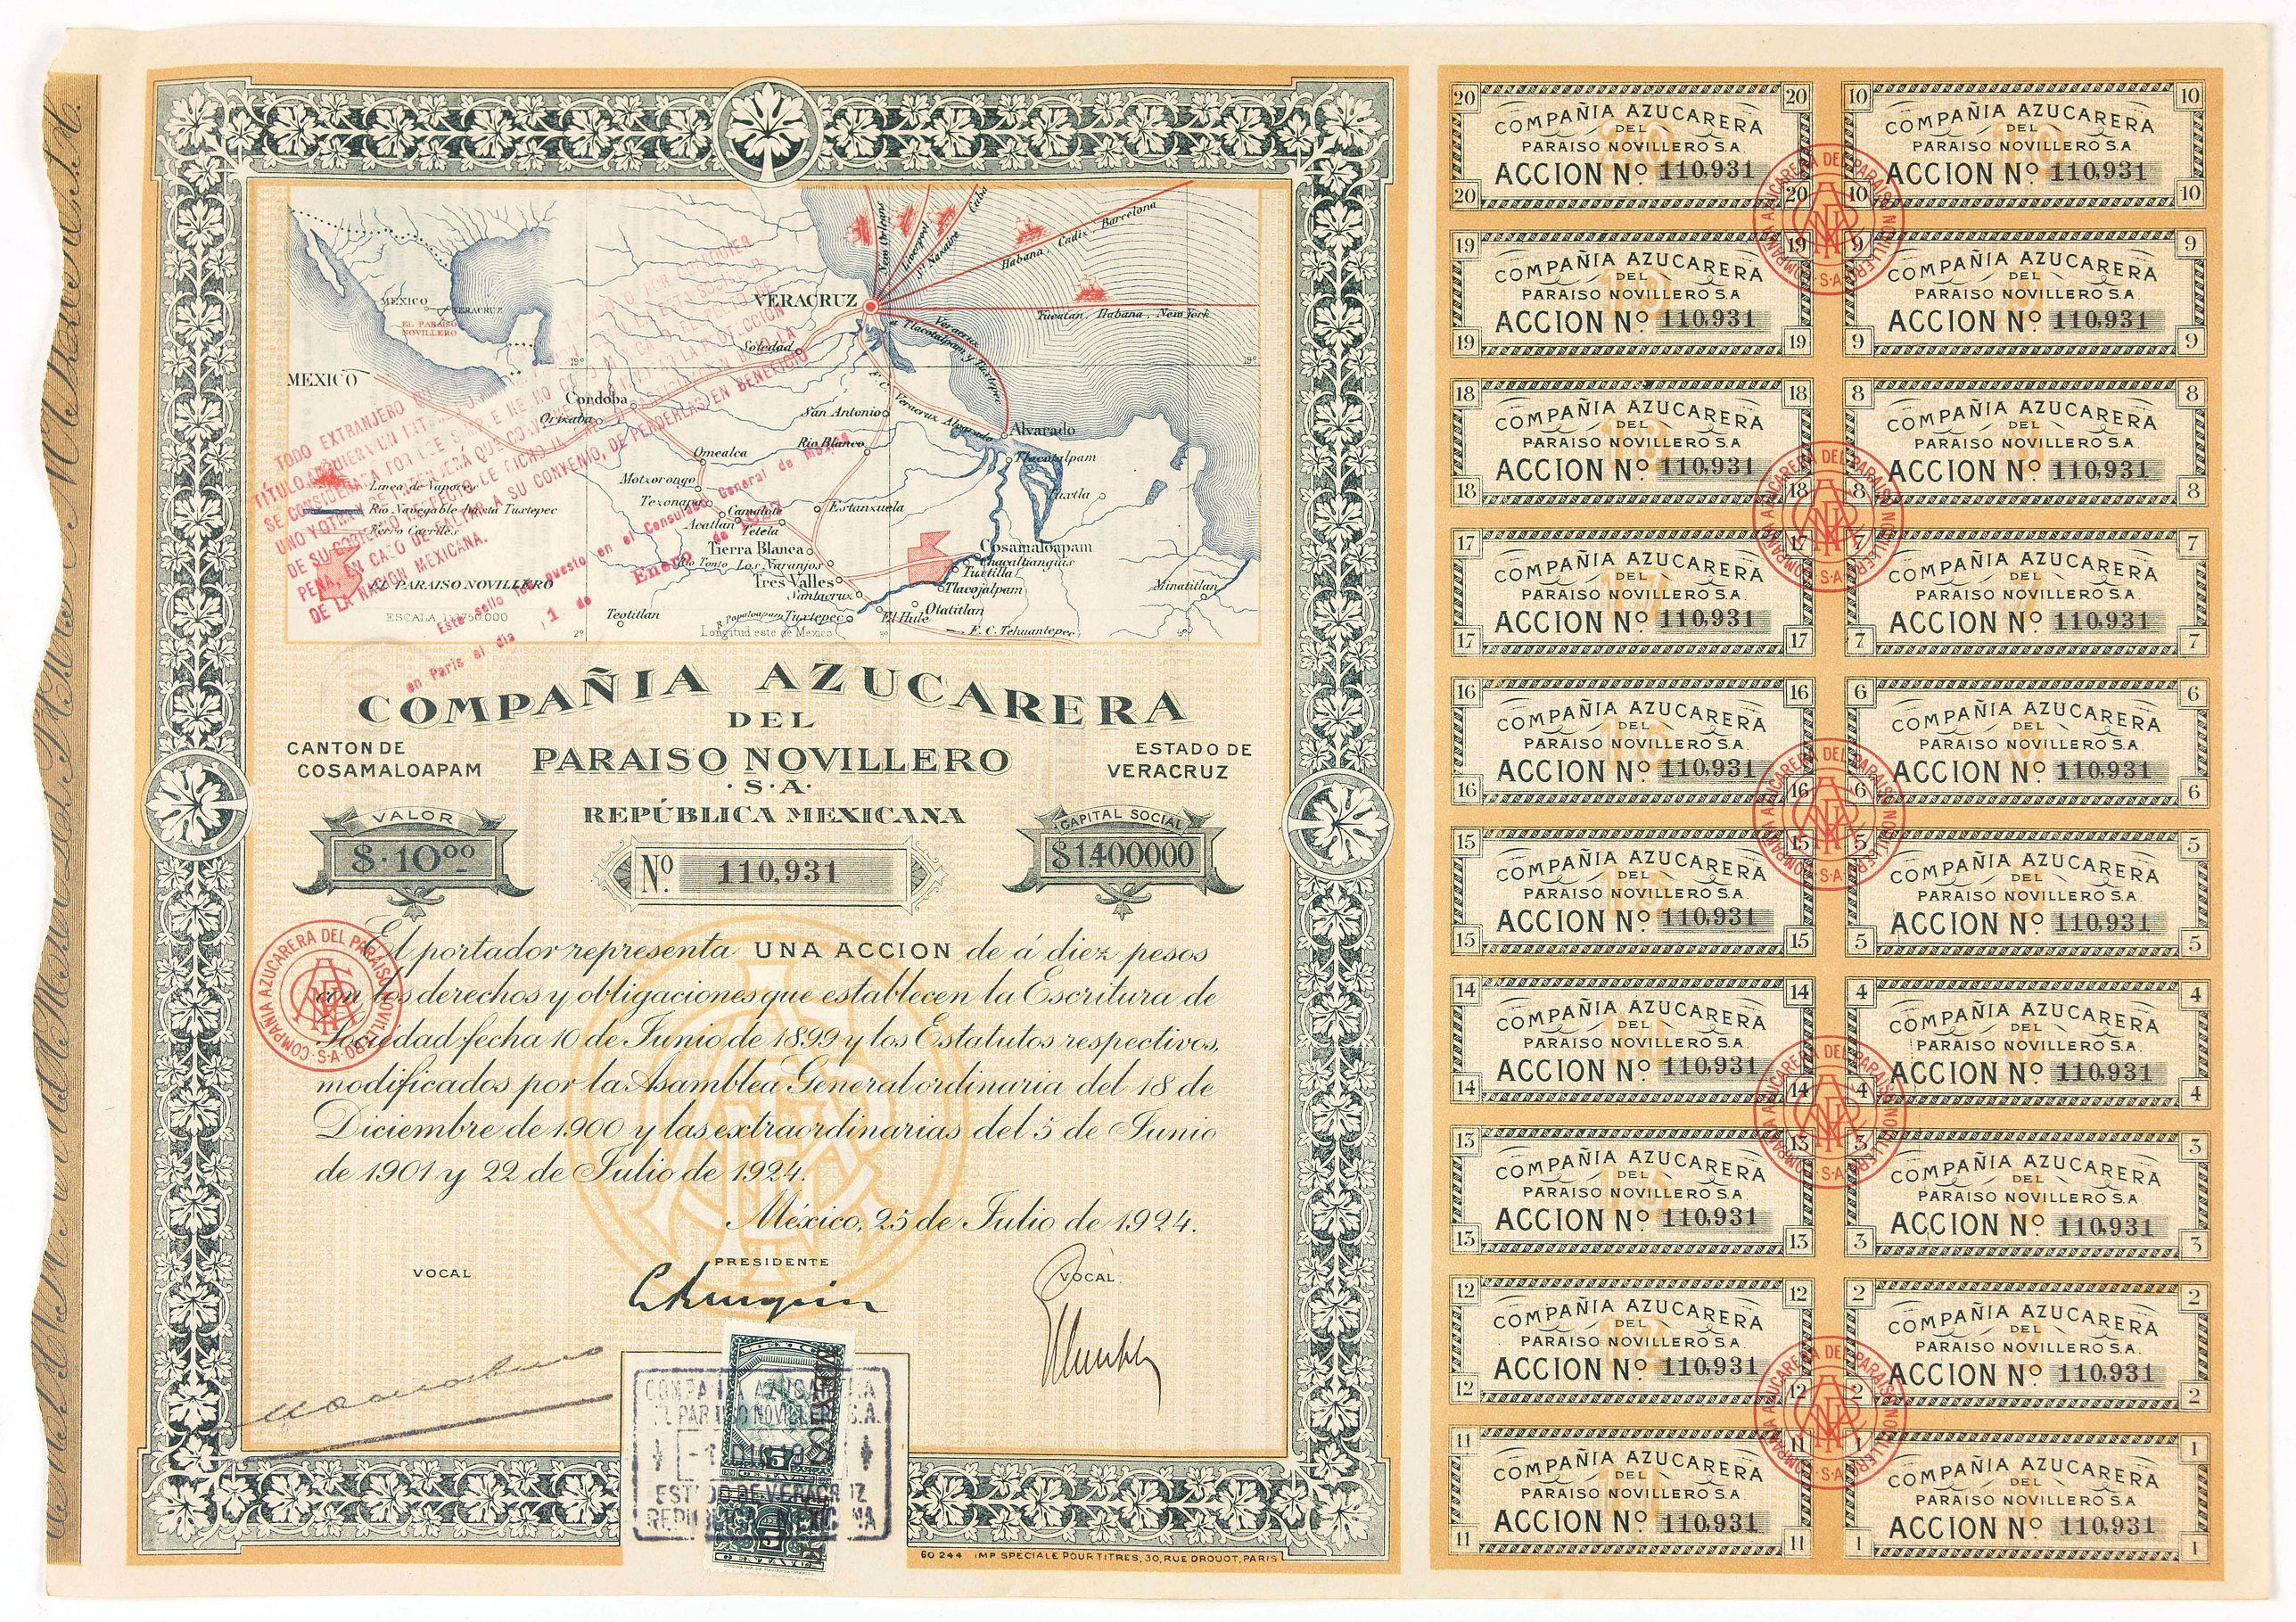 Compania Azucarera de Paraiso Novillero S.A. -  Accion de 10 pesos. No. 110,931  (Share certificate)